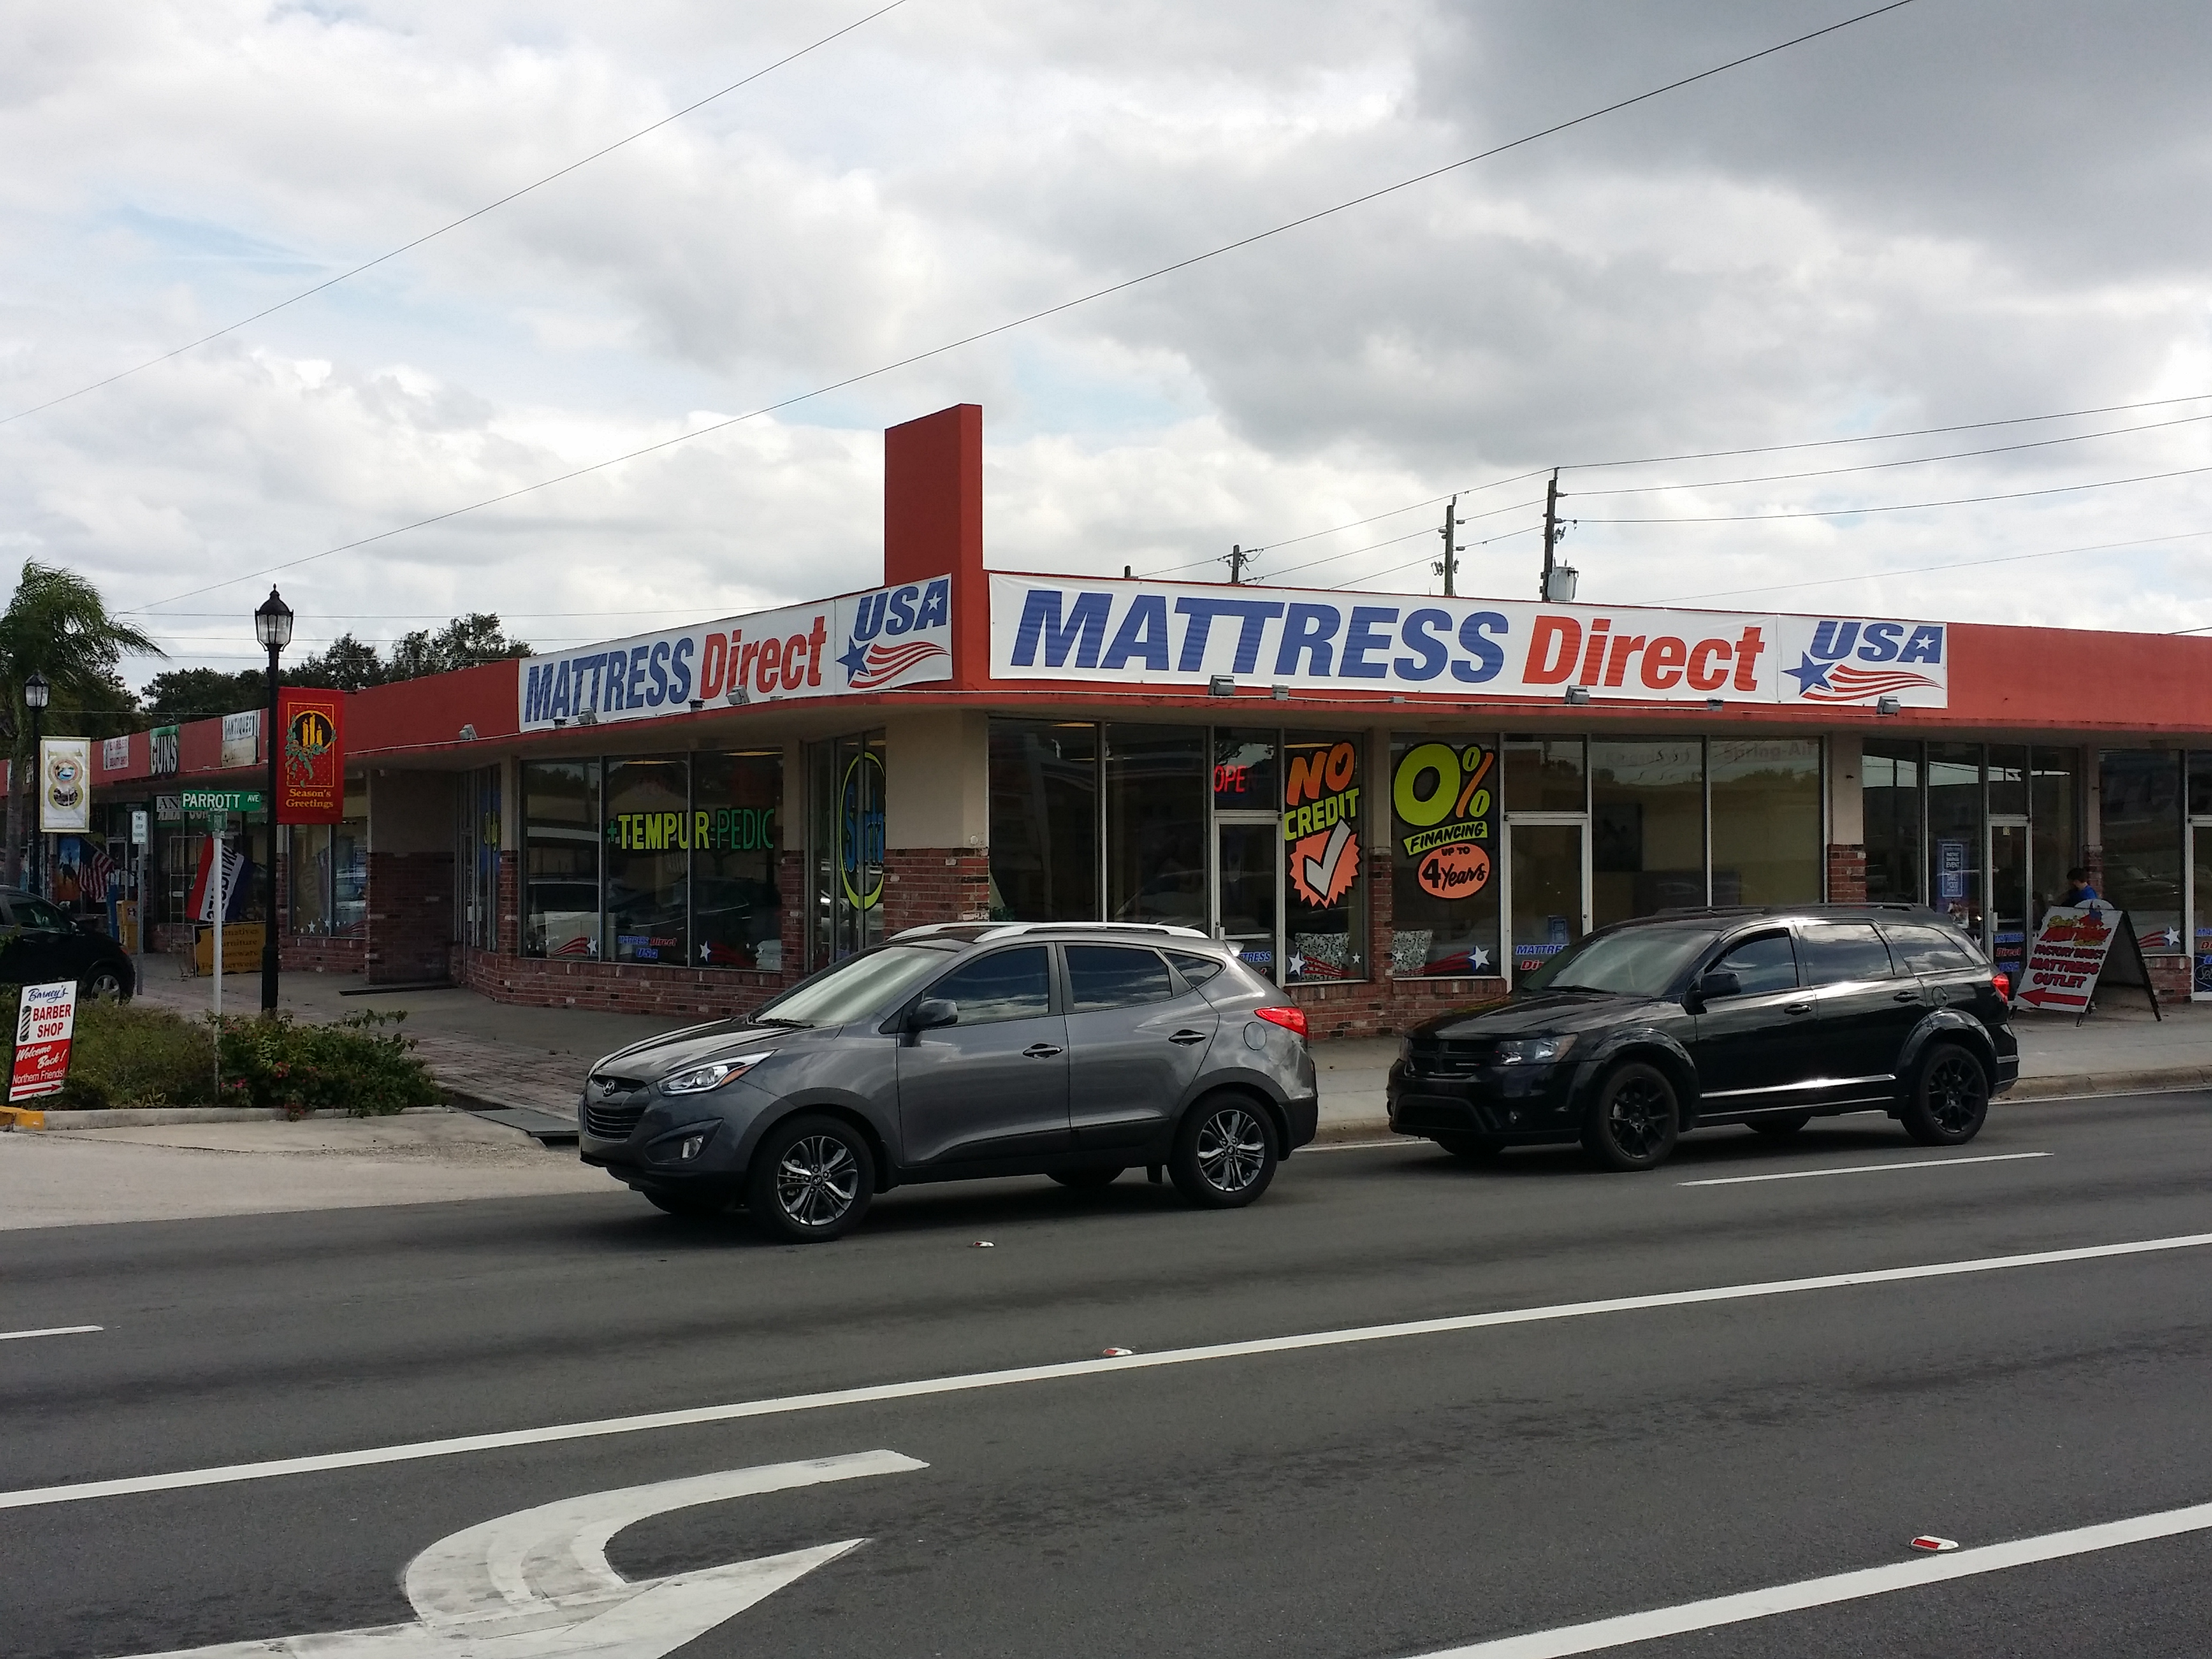 Mattress Direct USA